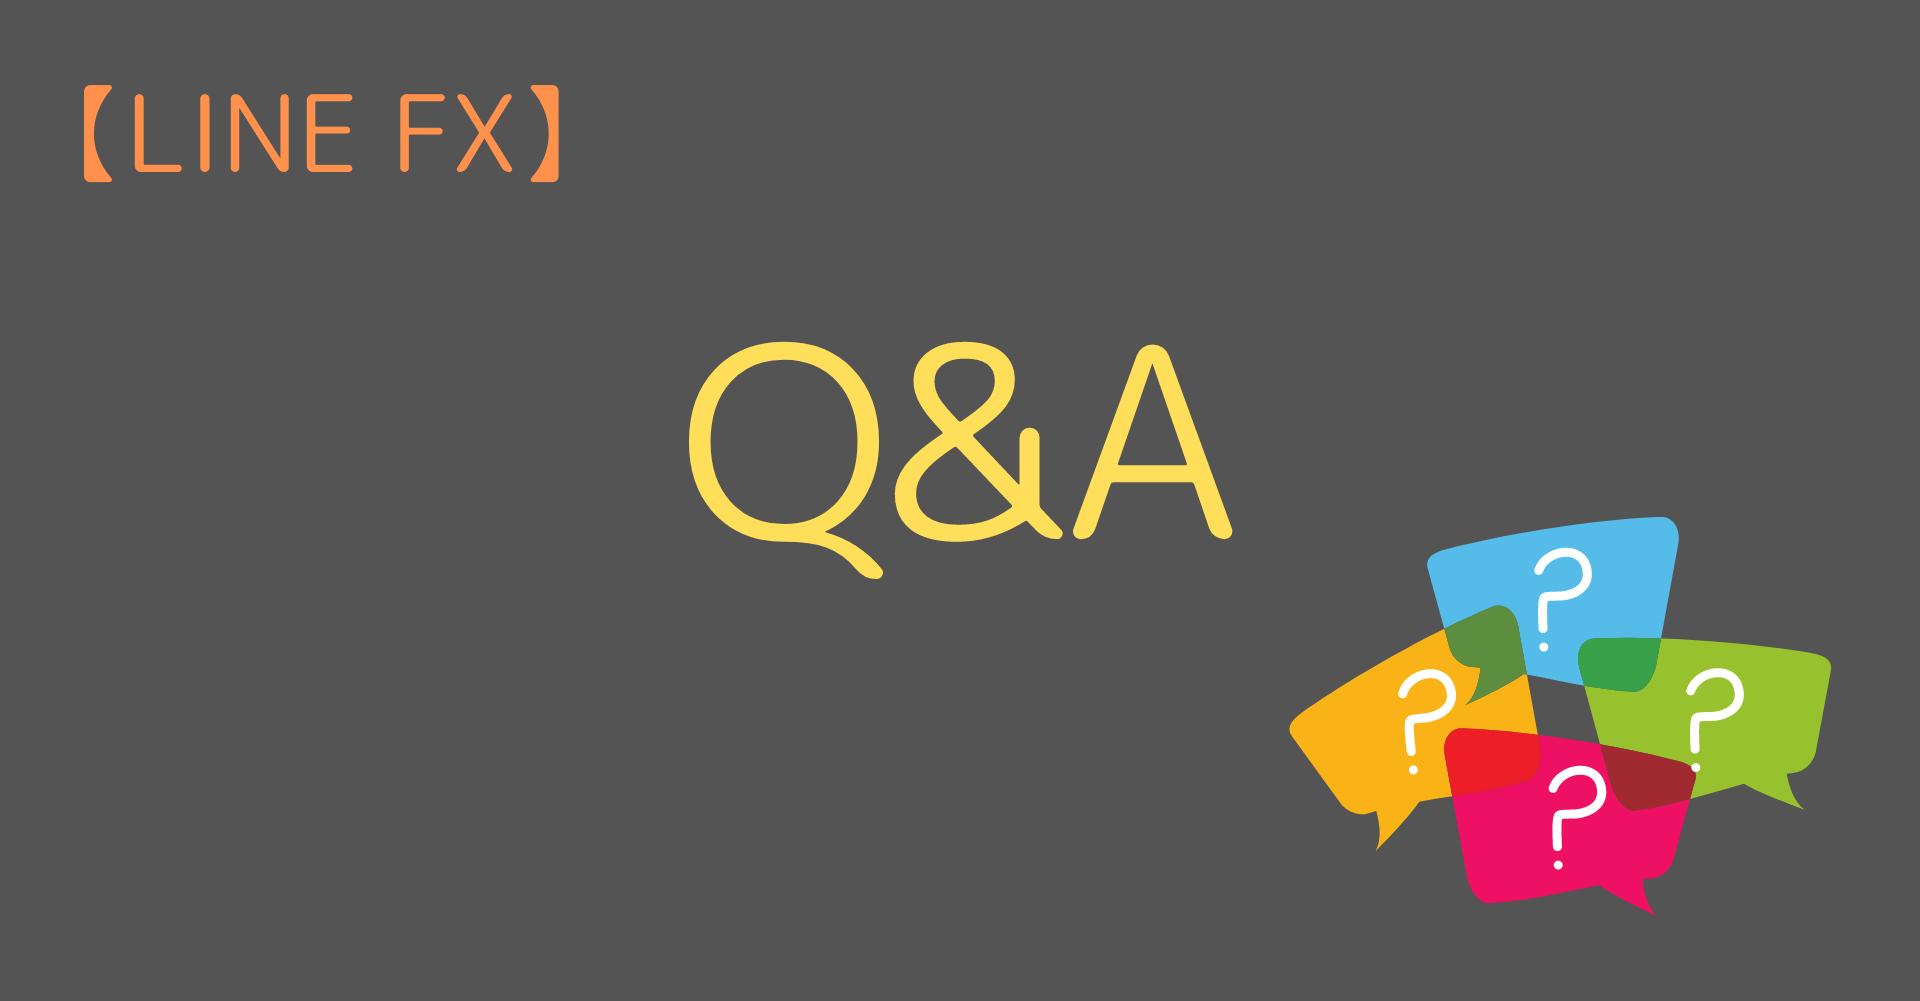 LINE FX Q&A